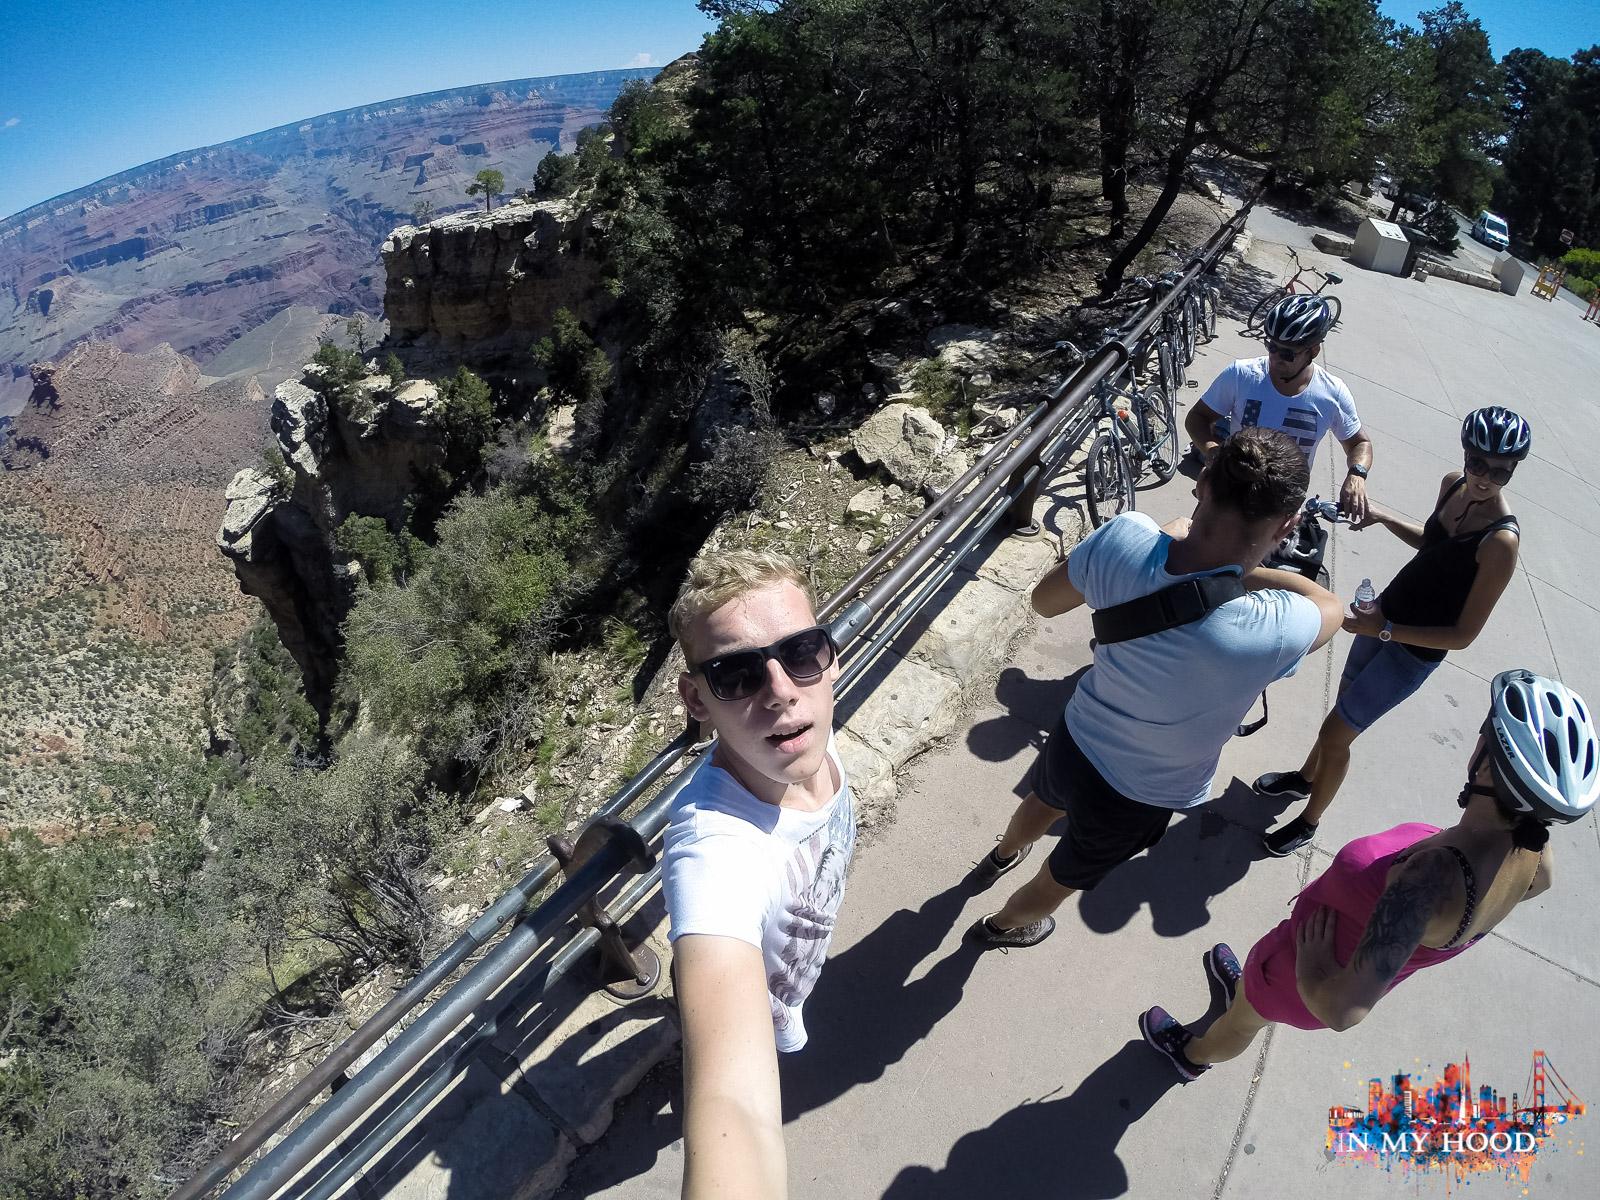 Urlaub USA Grand Canyon, In my Hood, Tobias, USA, America, Reise, Amerika, Arizona